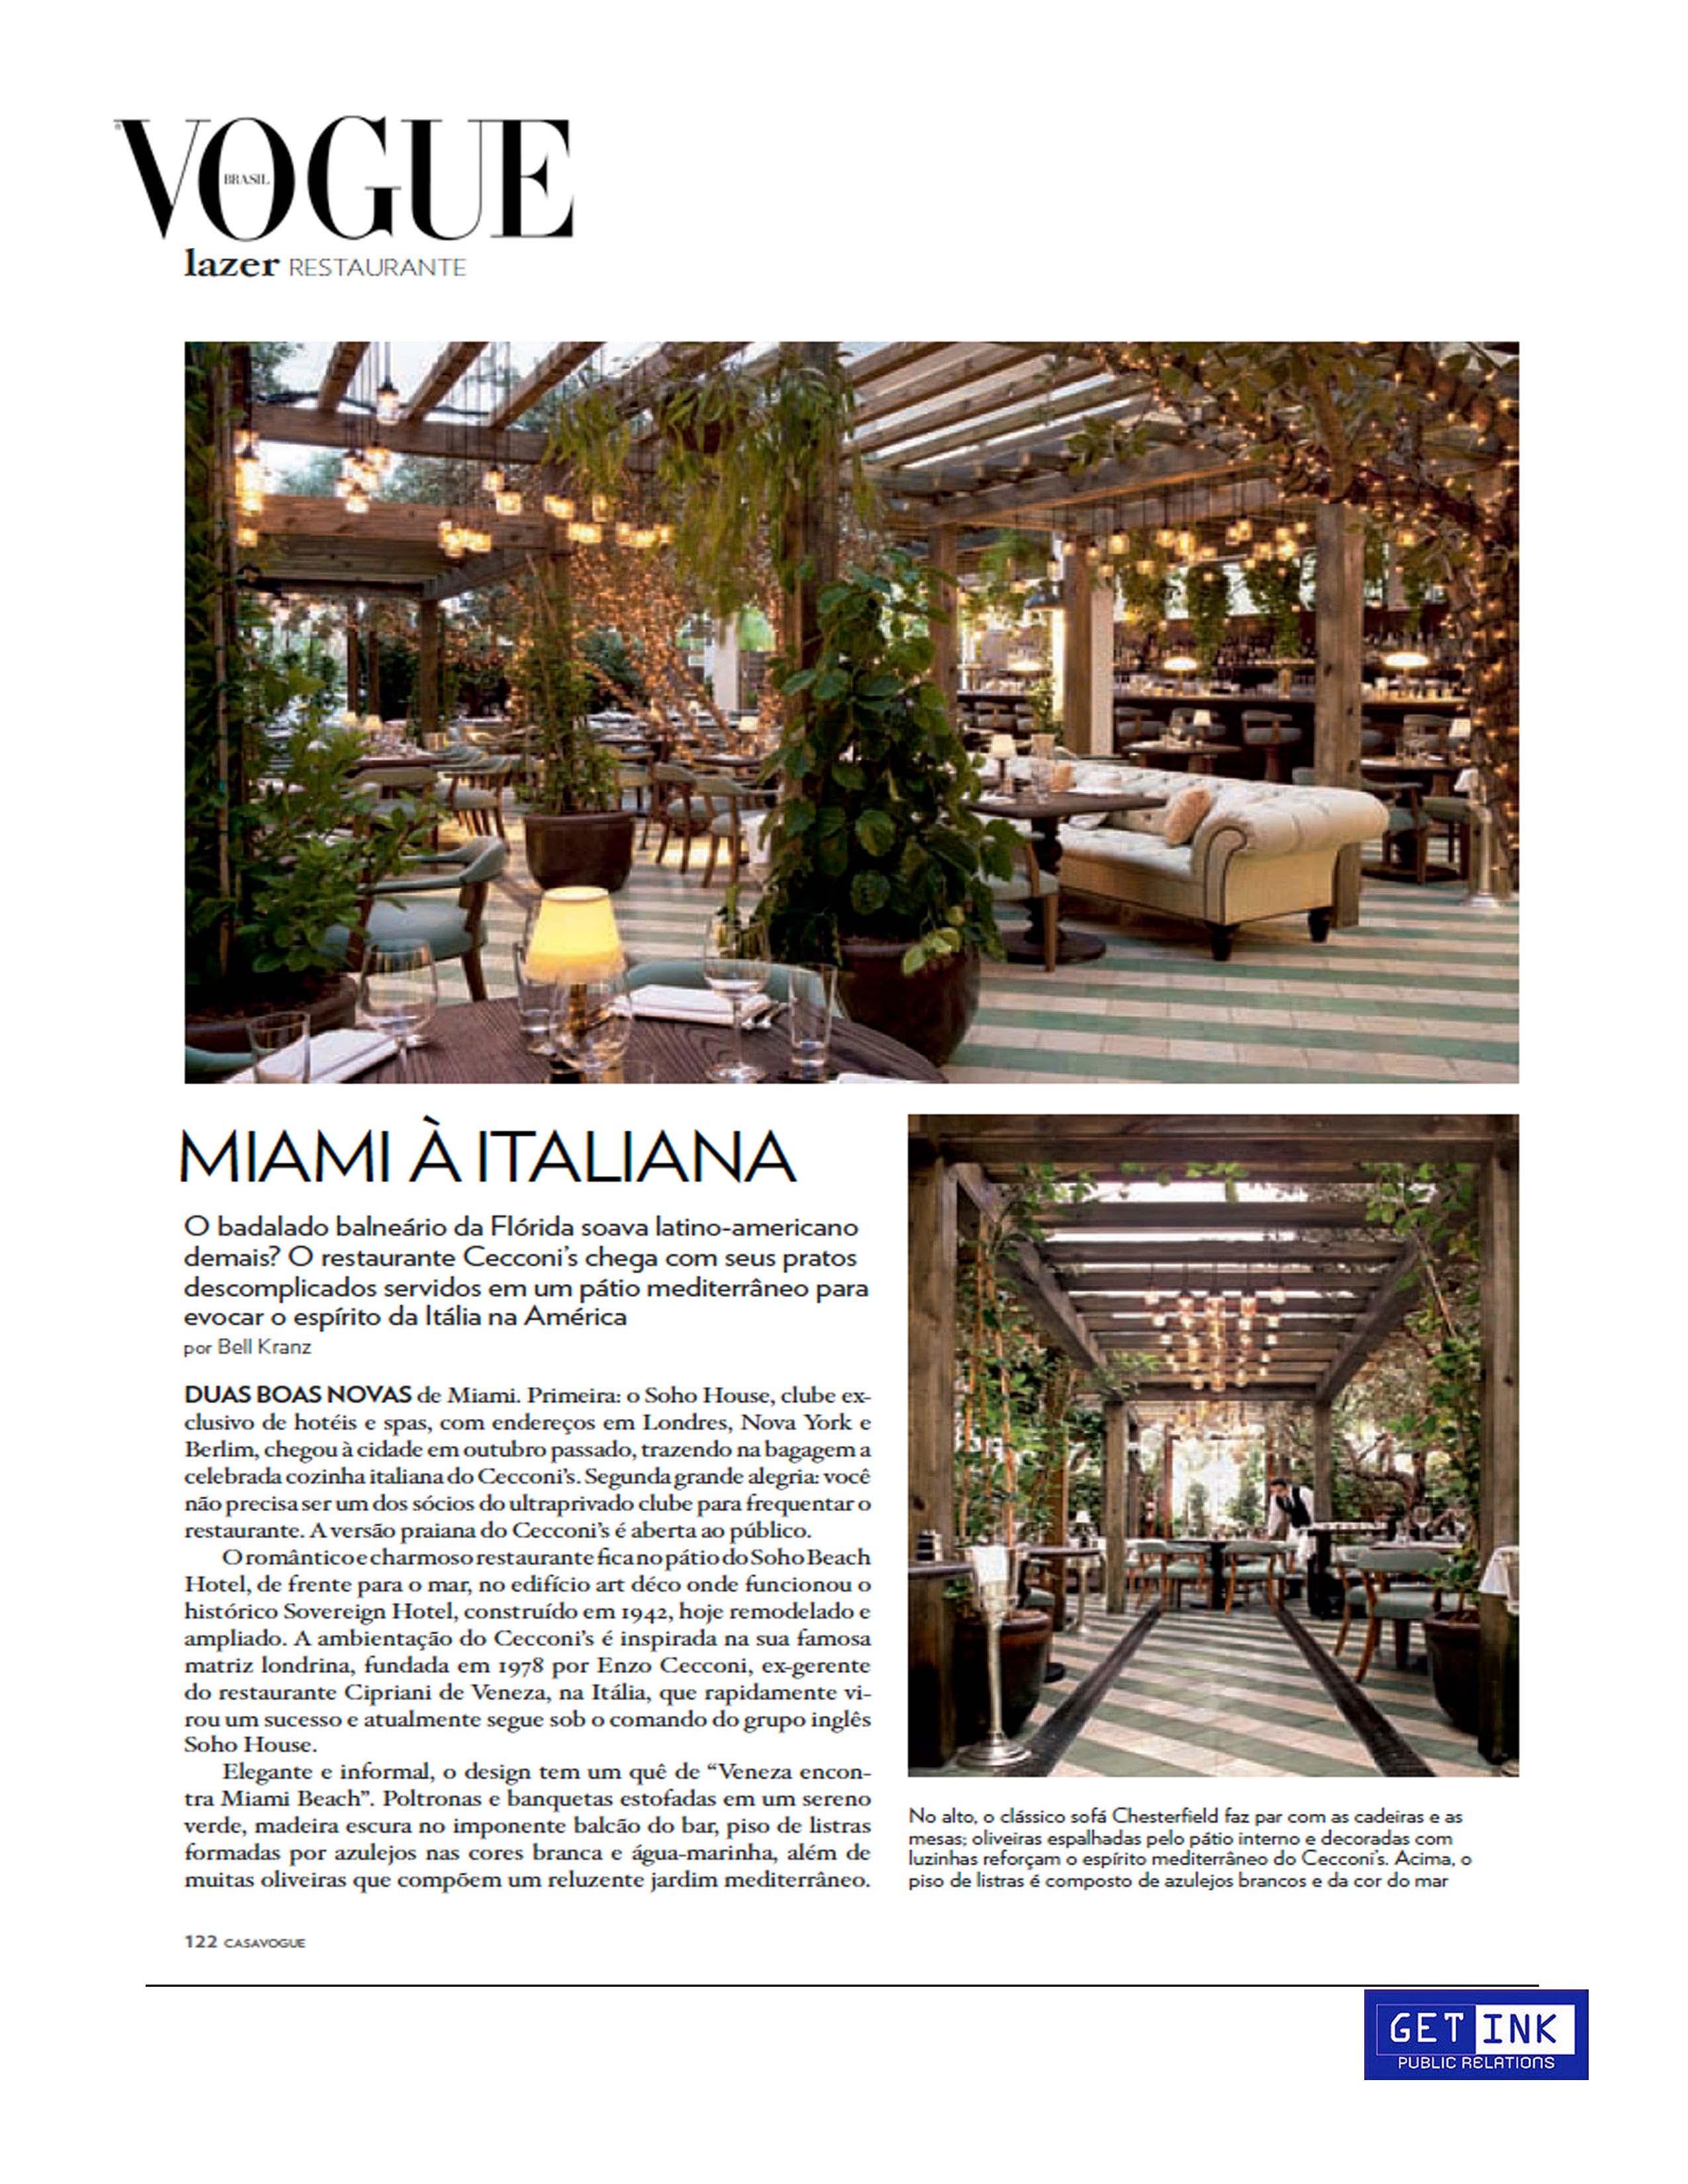 Cecconi's Miami Soho Beach House in Vogue Brazil - Get Ink PR